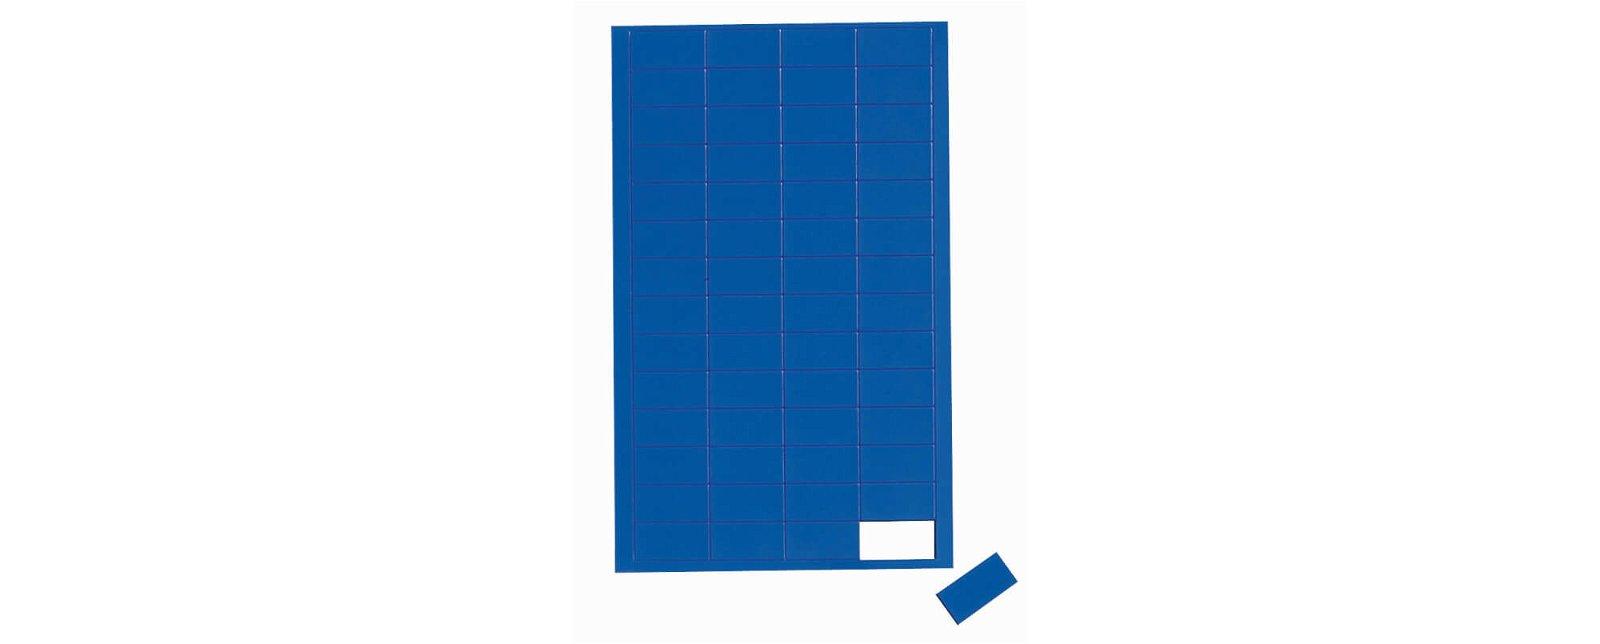 Magnetsymbole Rechteck,  56 St./Btl., blau